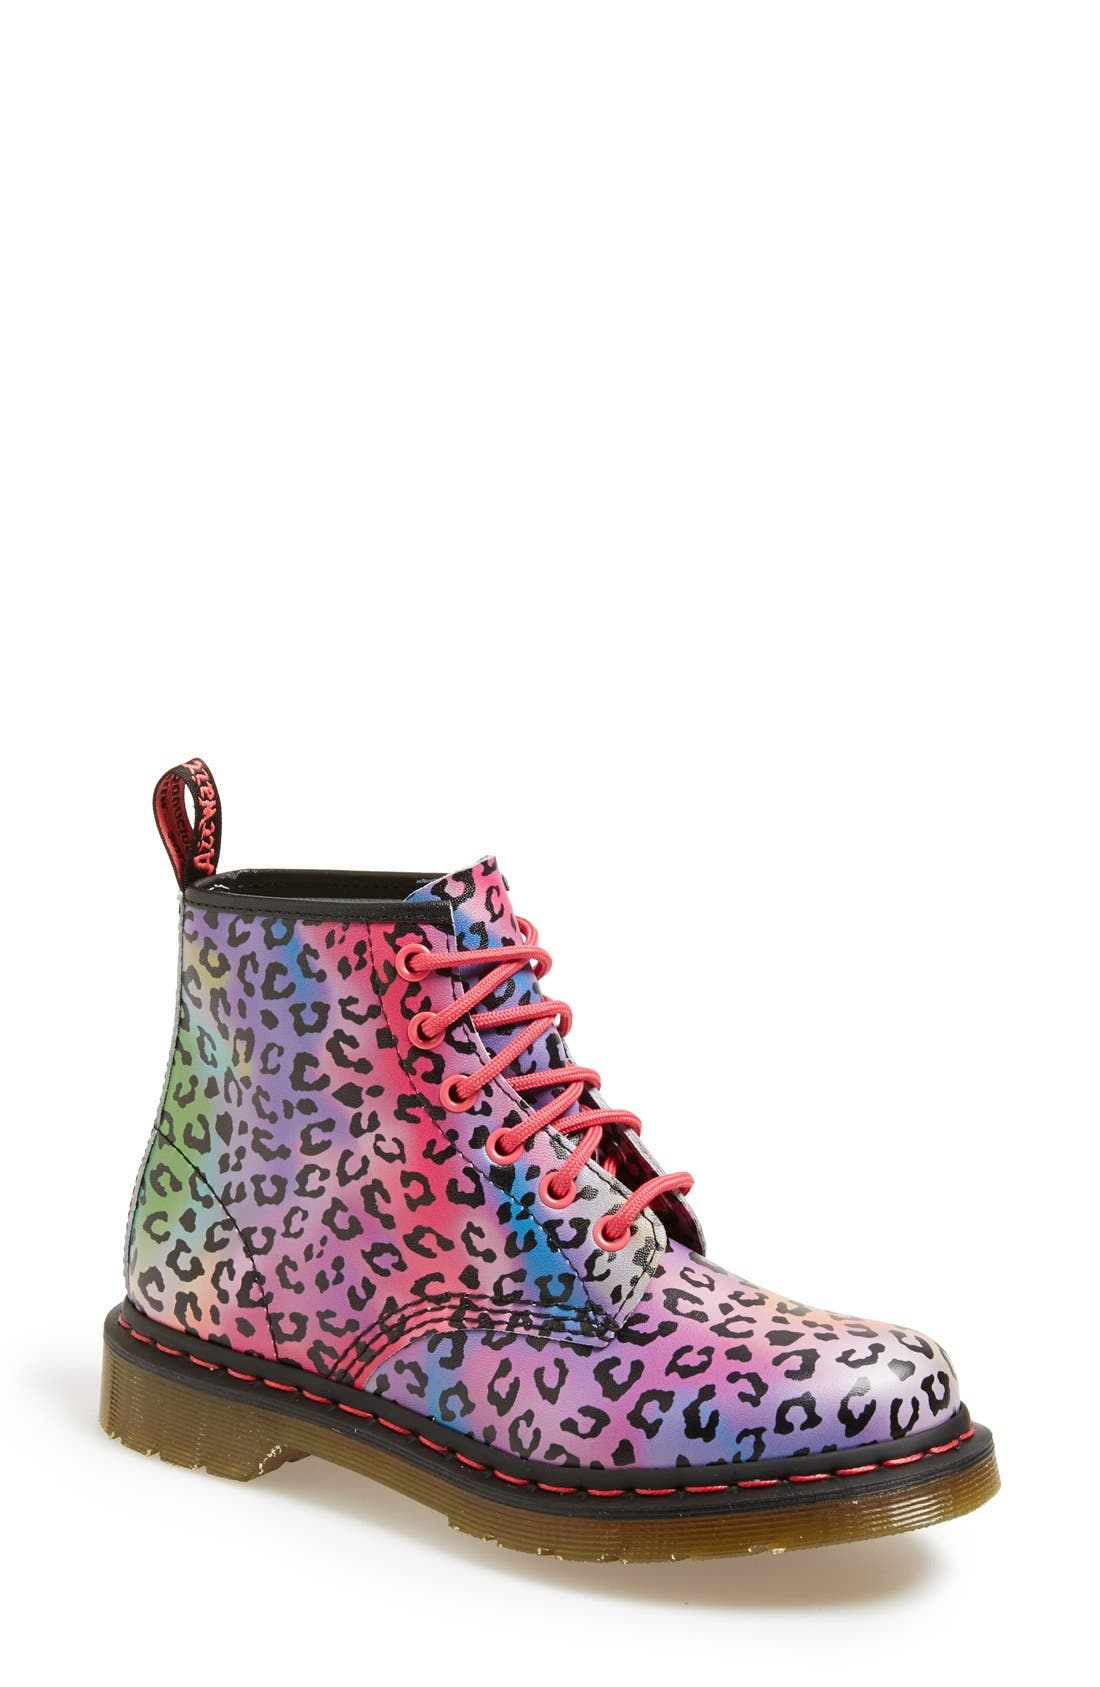 Main Image - Dr. Martens '101' Leopard Print Leather Boot (Women)